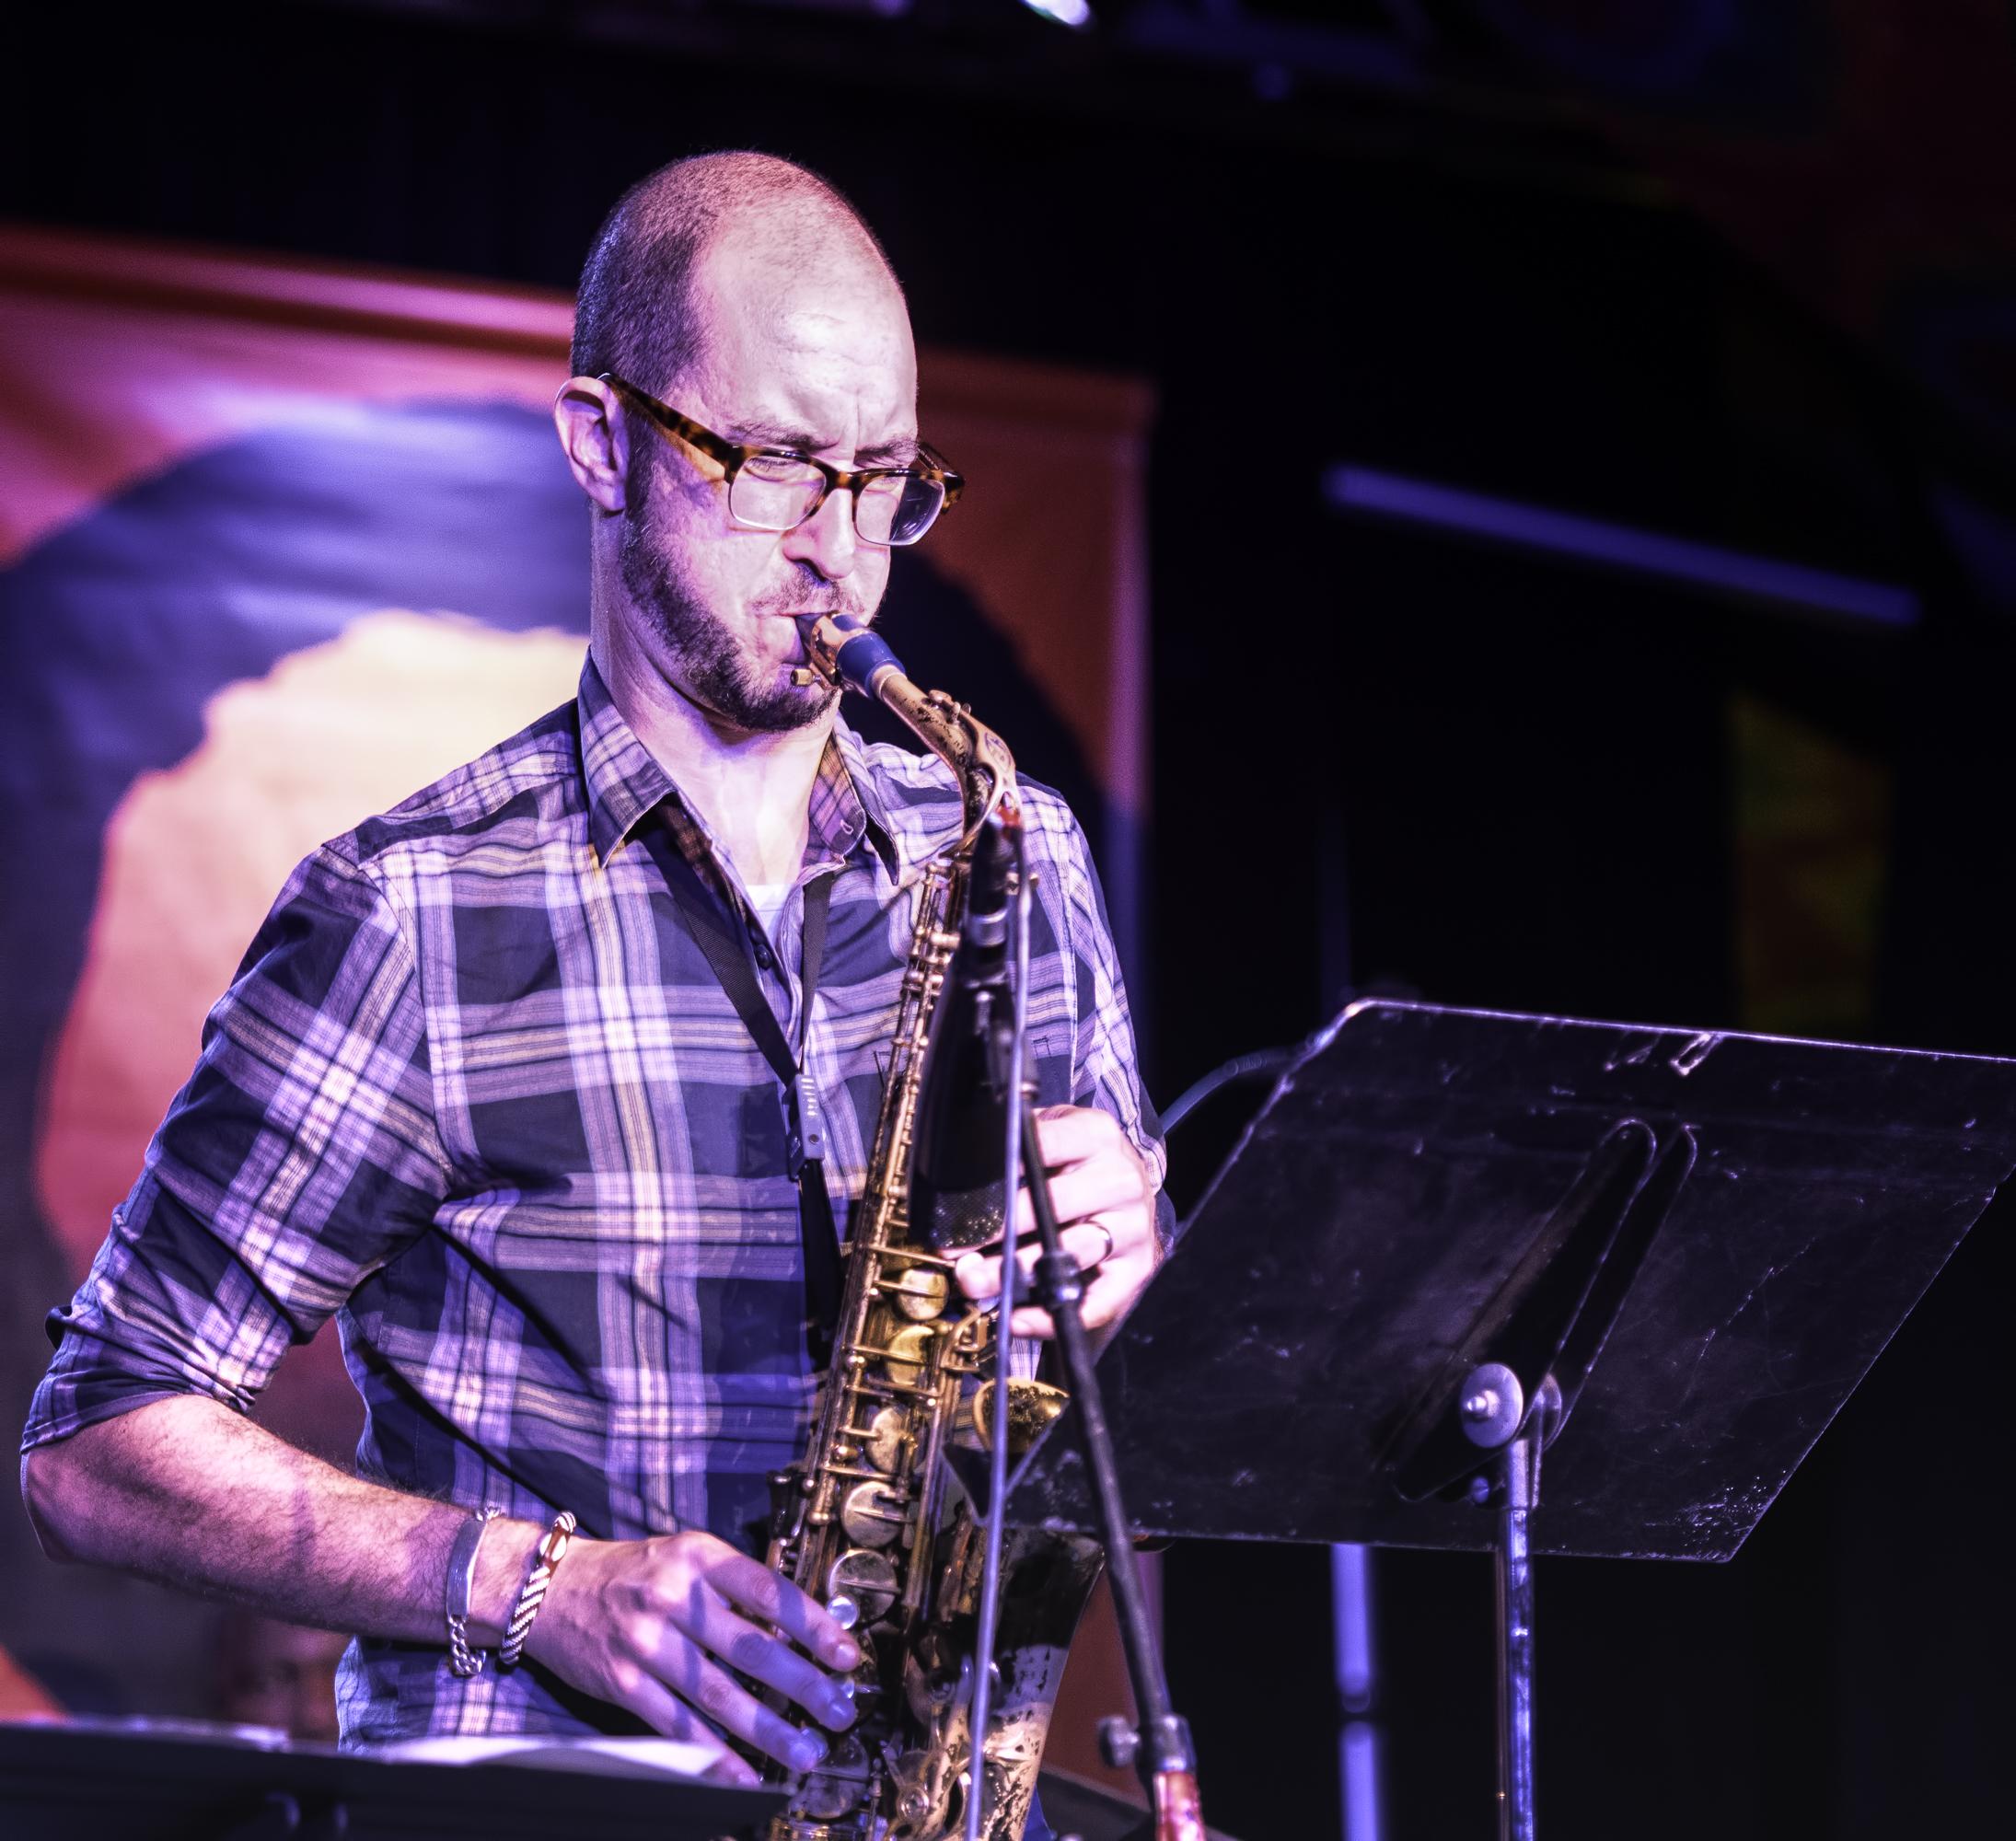 Steve Lehman with the Vijay Iyer Sextet at the Monterey Jazz Festival